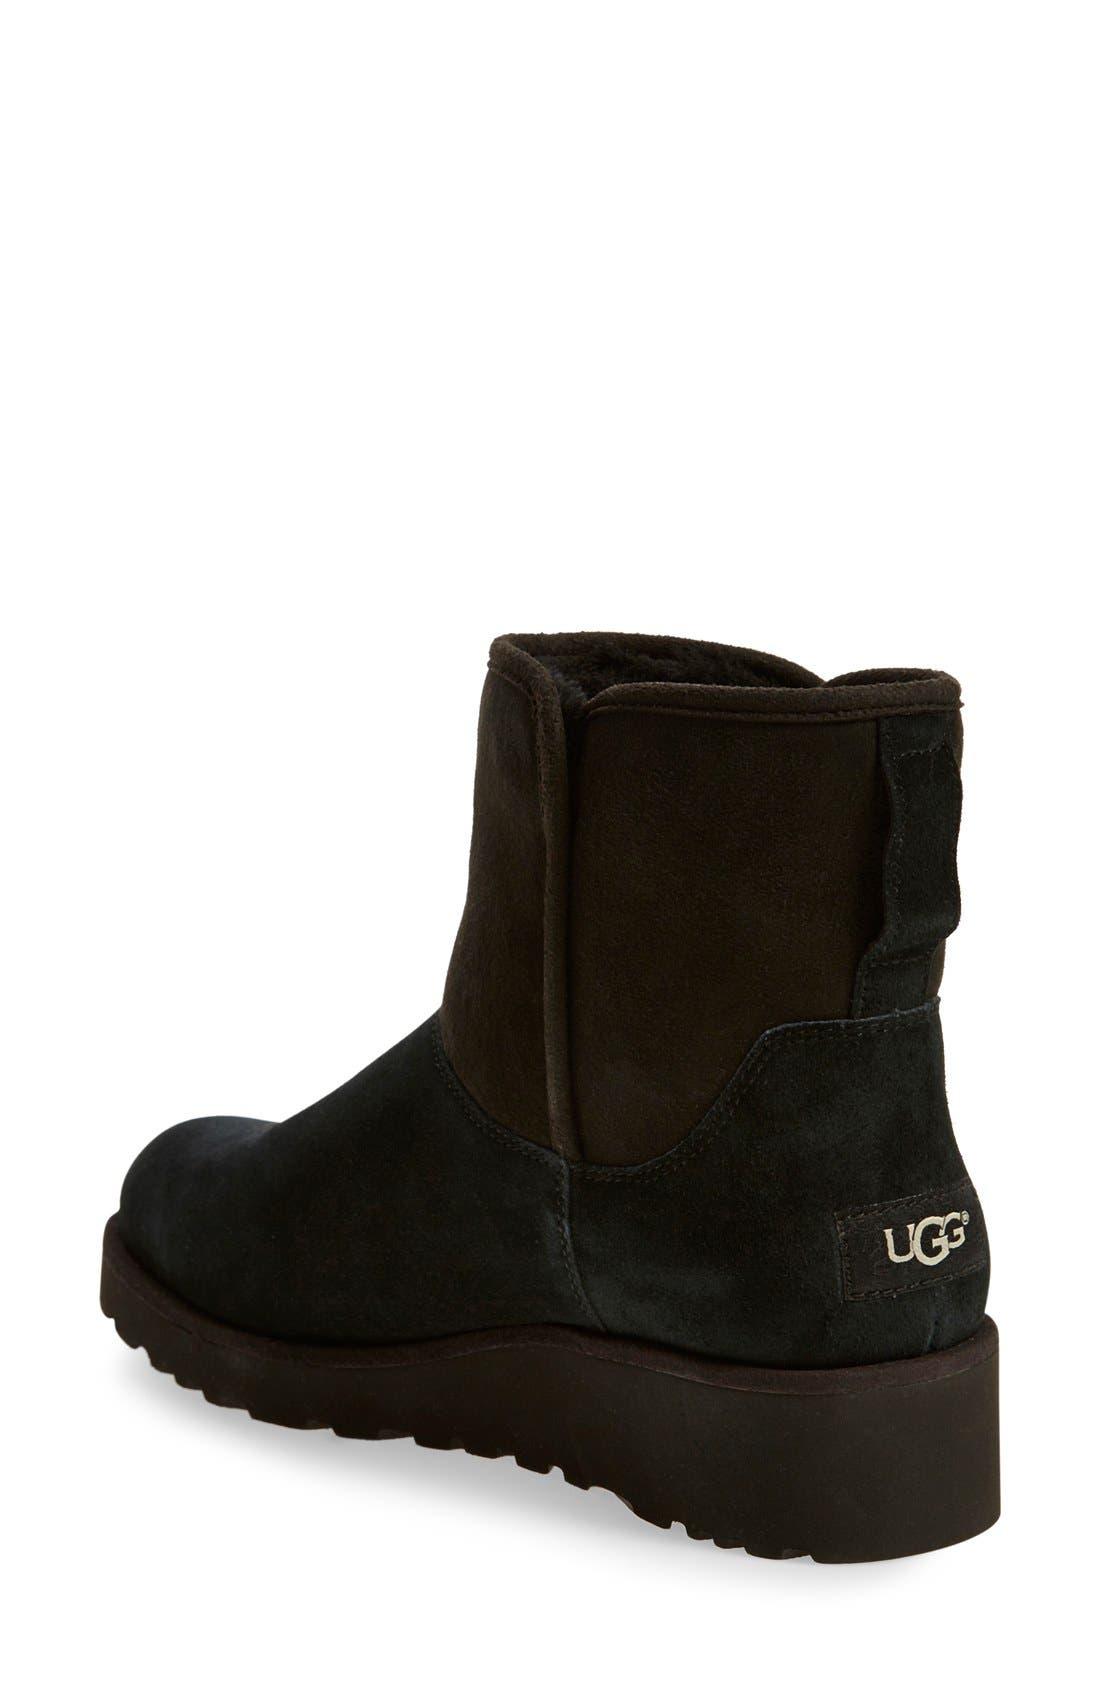 Alternate Image 2  - UGG® Kristin - Classic Slim™ Water Resistant Mini Boot (Women)